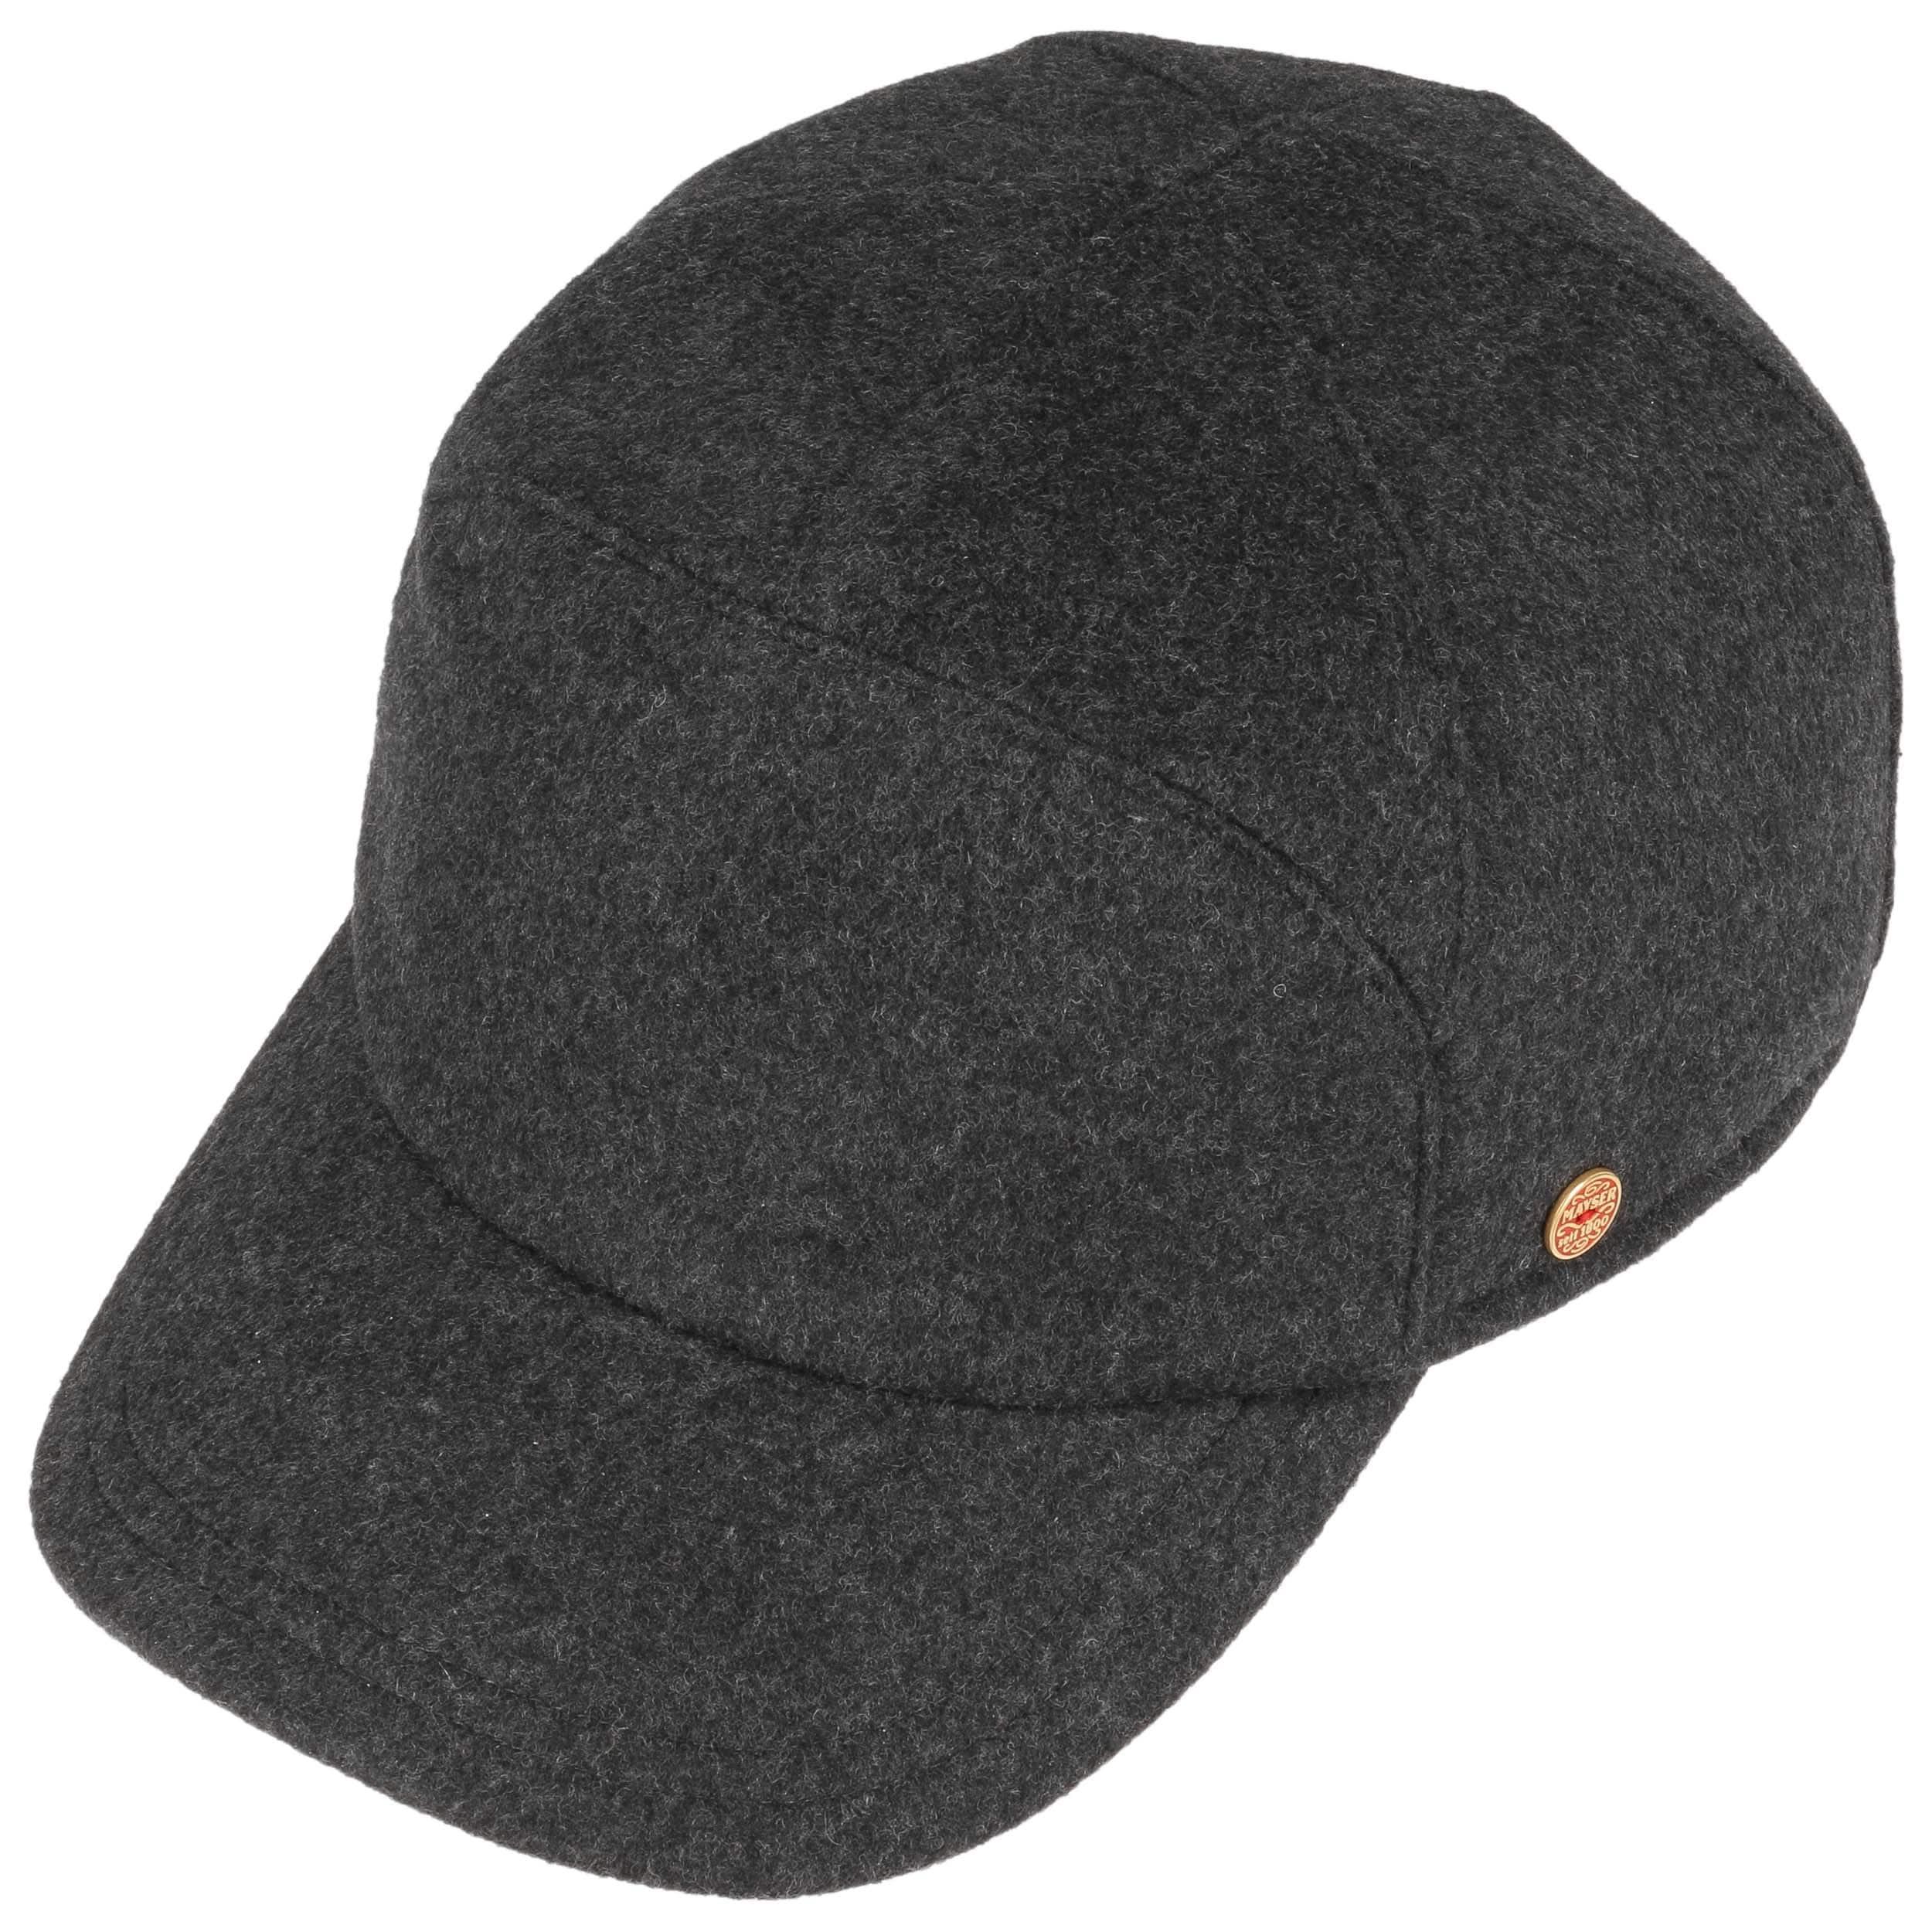 9c3854136 Premium Earflaps Baseball Cap by Mayser